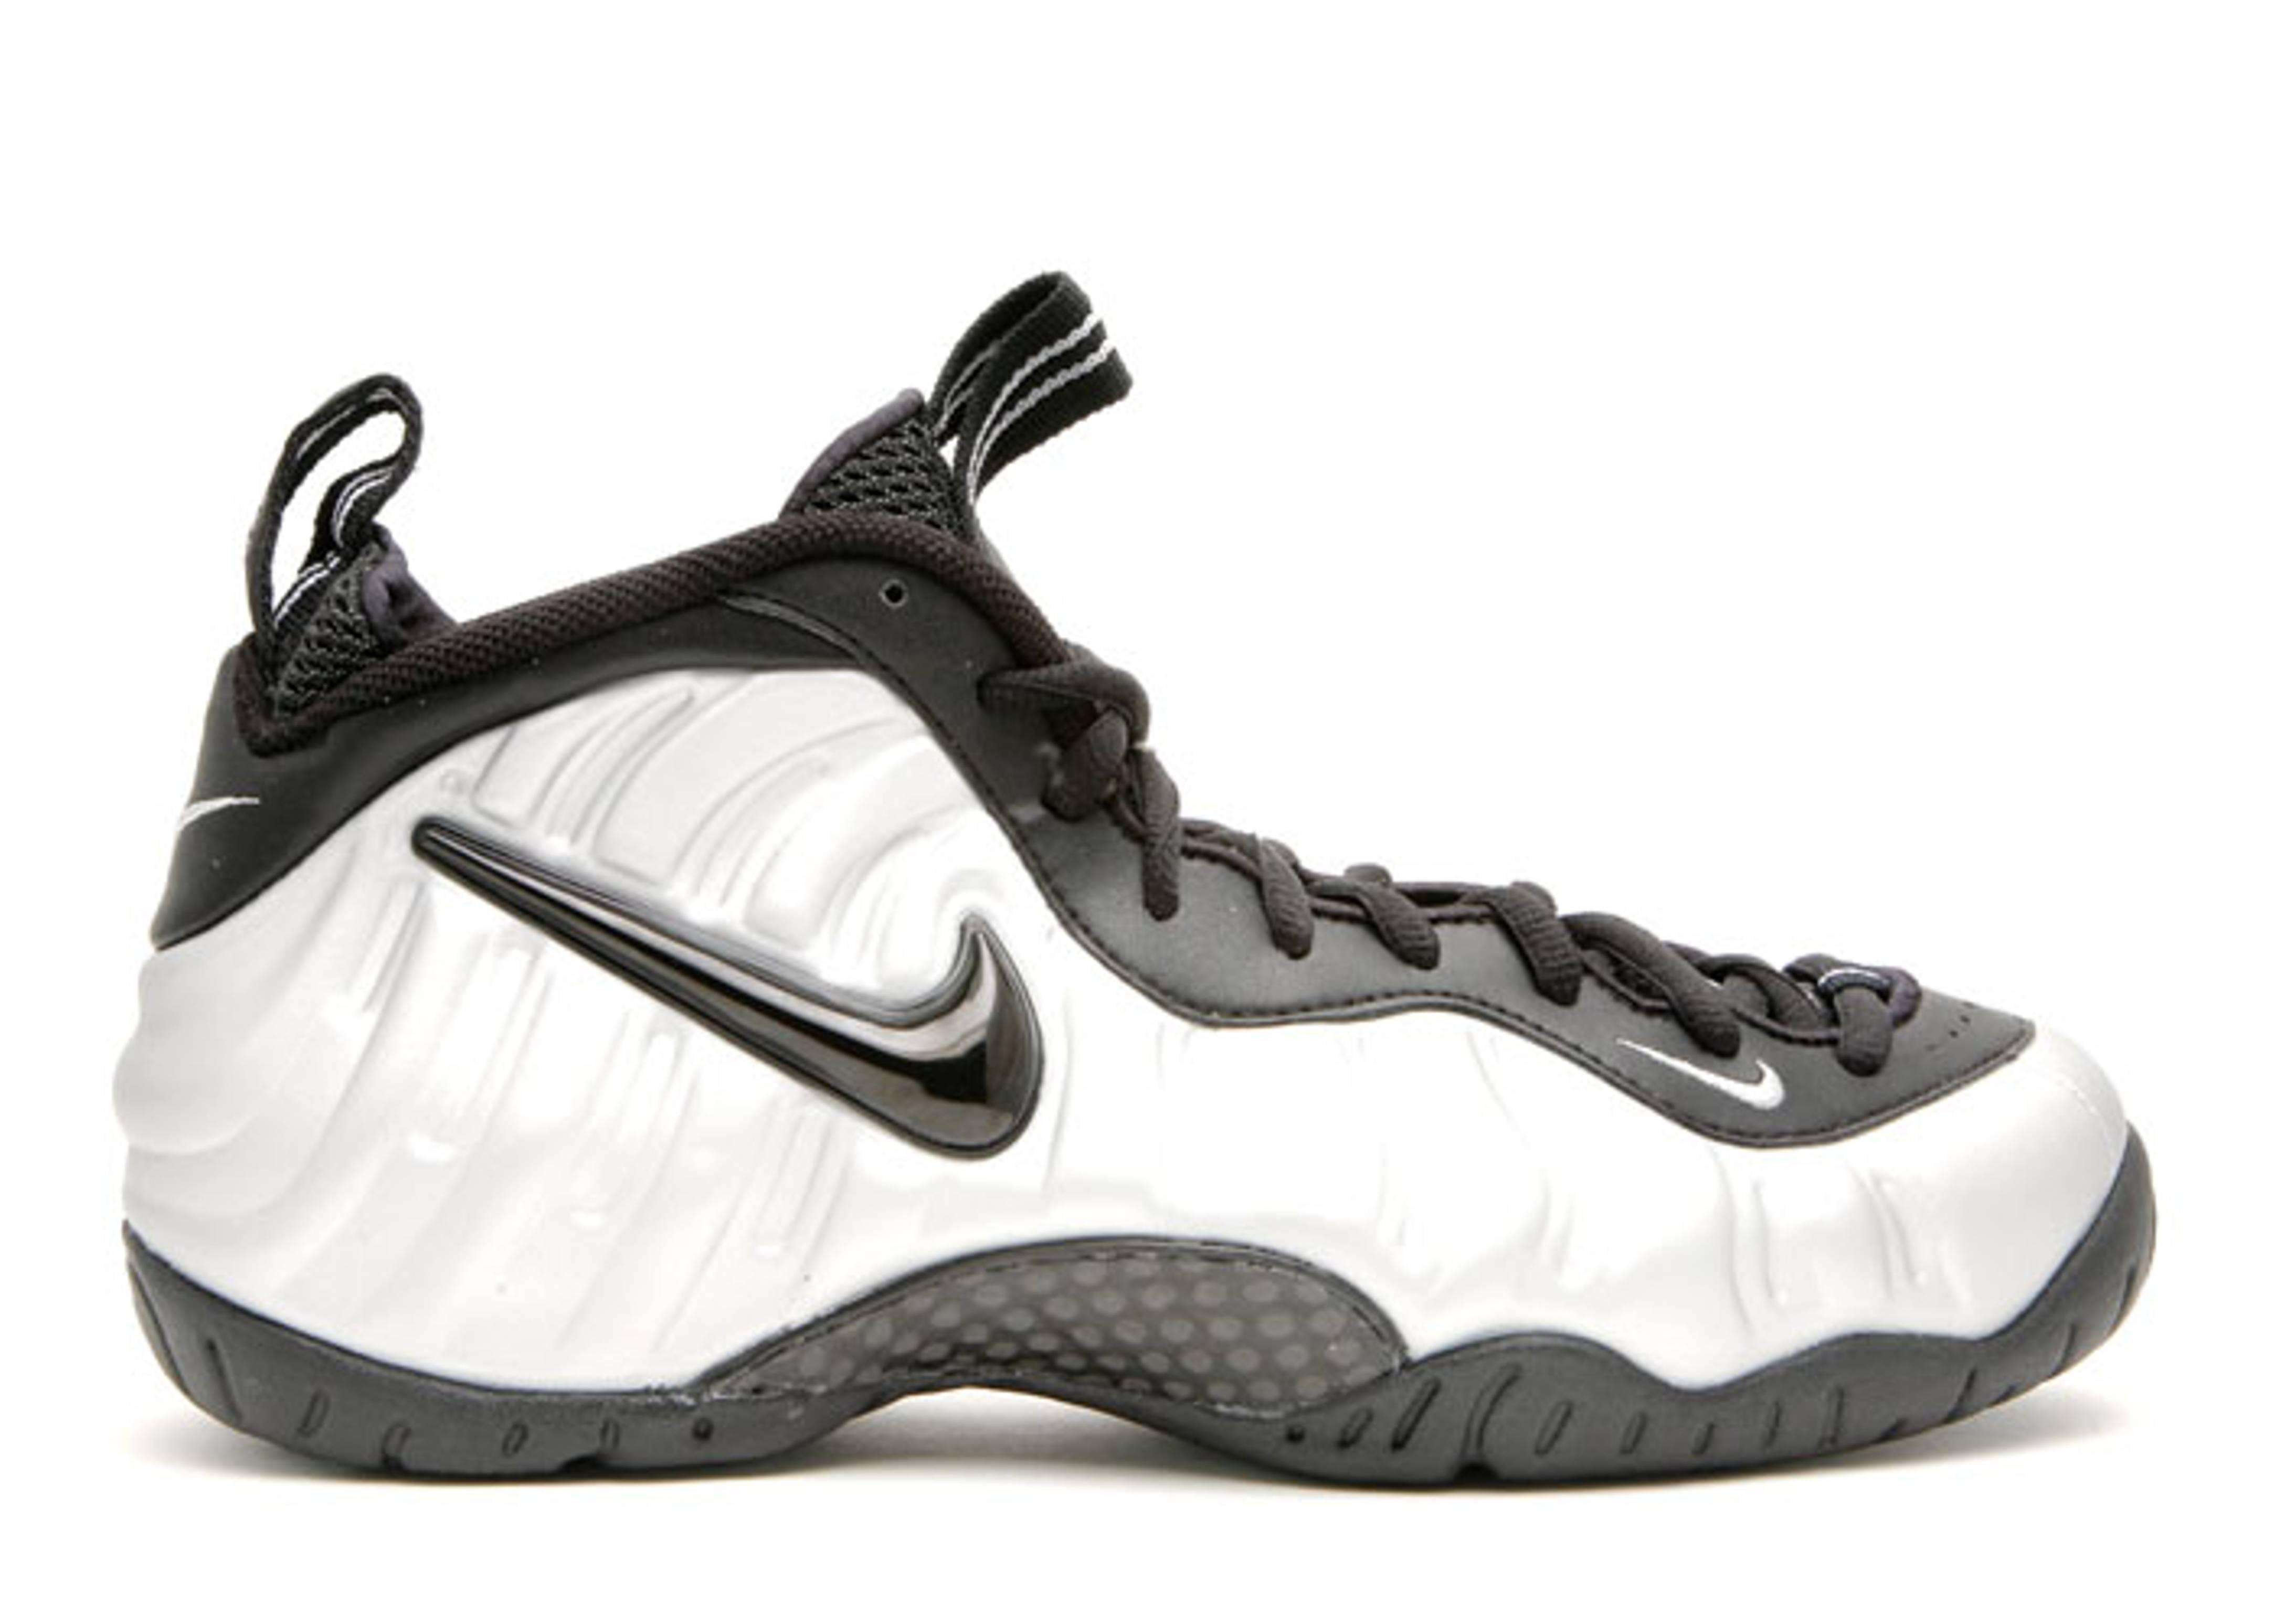 fe35cbbb7a4c2 ... nike. air foamposite pro  Nike Air Foamposite Pro Metallic Silver Black  ...